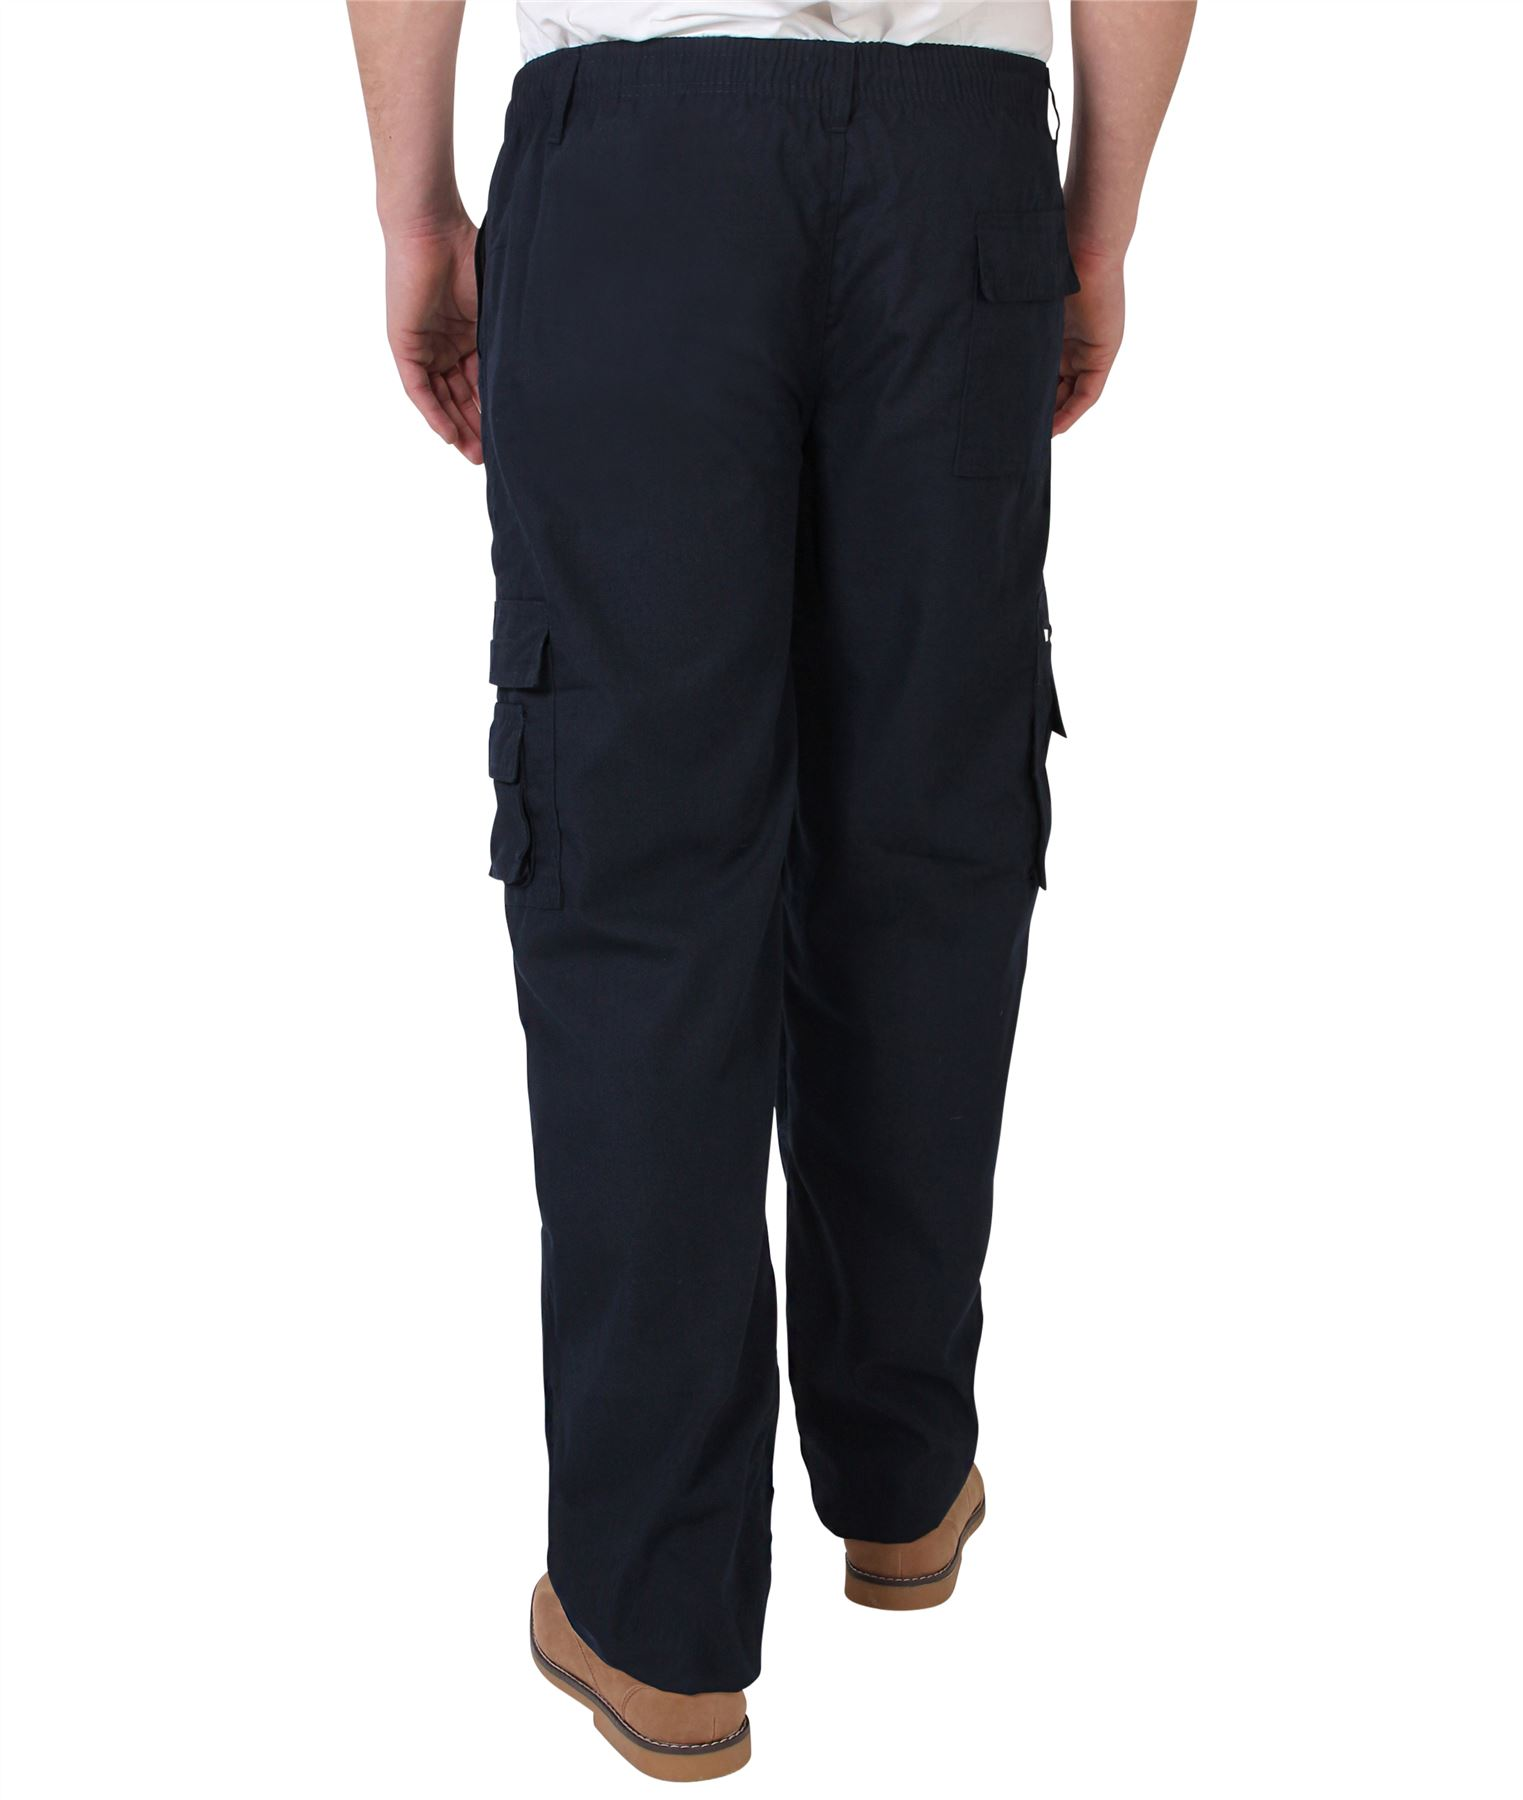 Pantalones-Hombre-Estilo-Cargo-Militar-Combate-Multibolsillos-Casual miniatura 7